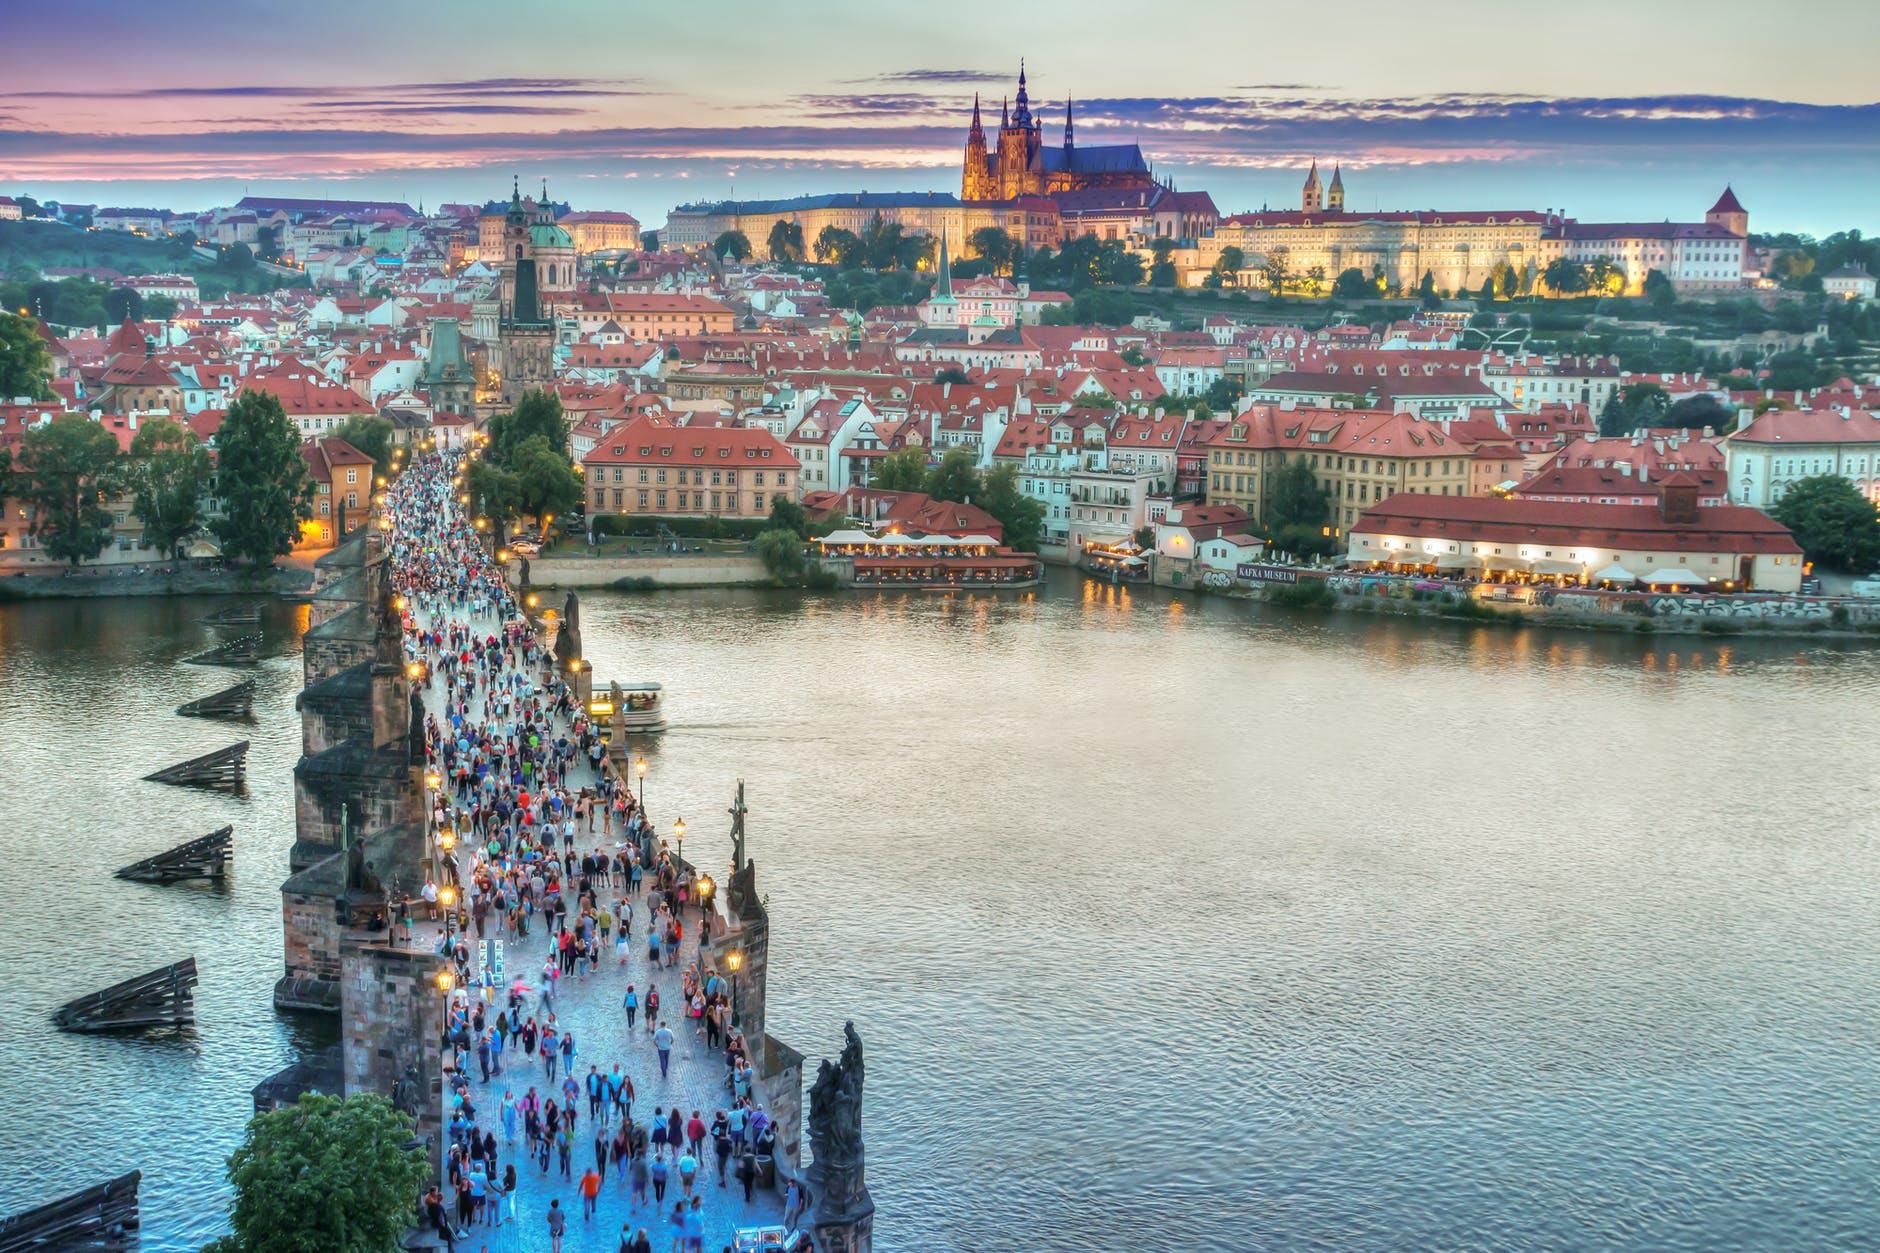 Byen Prag